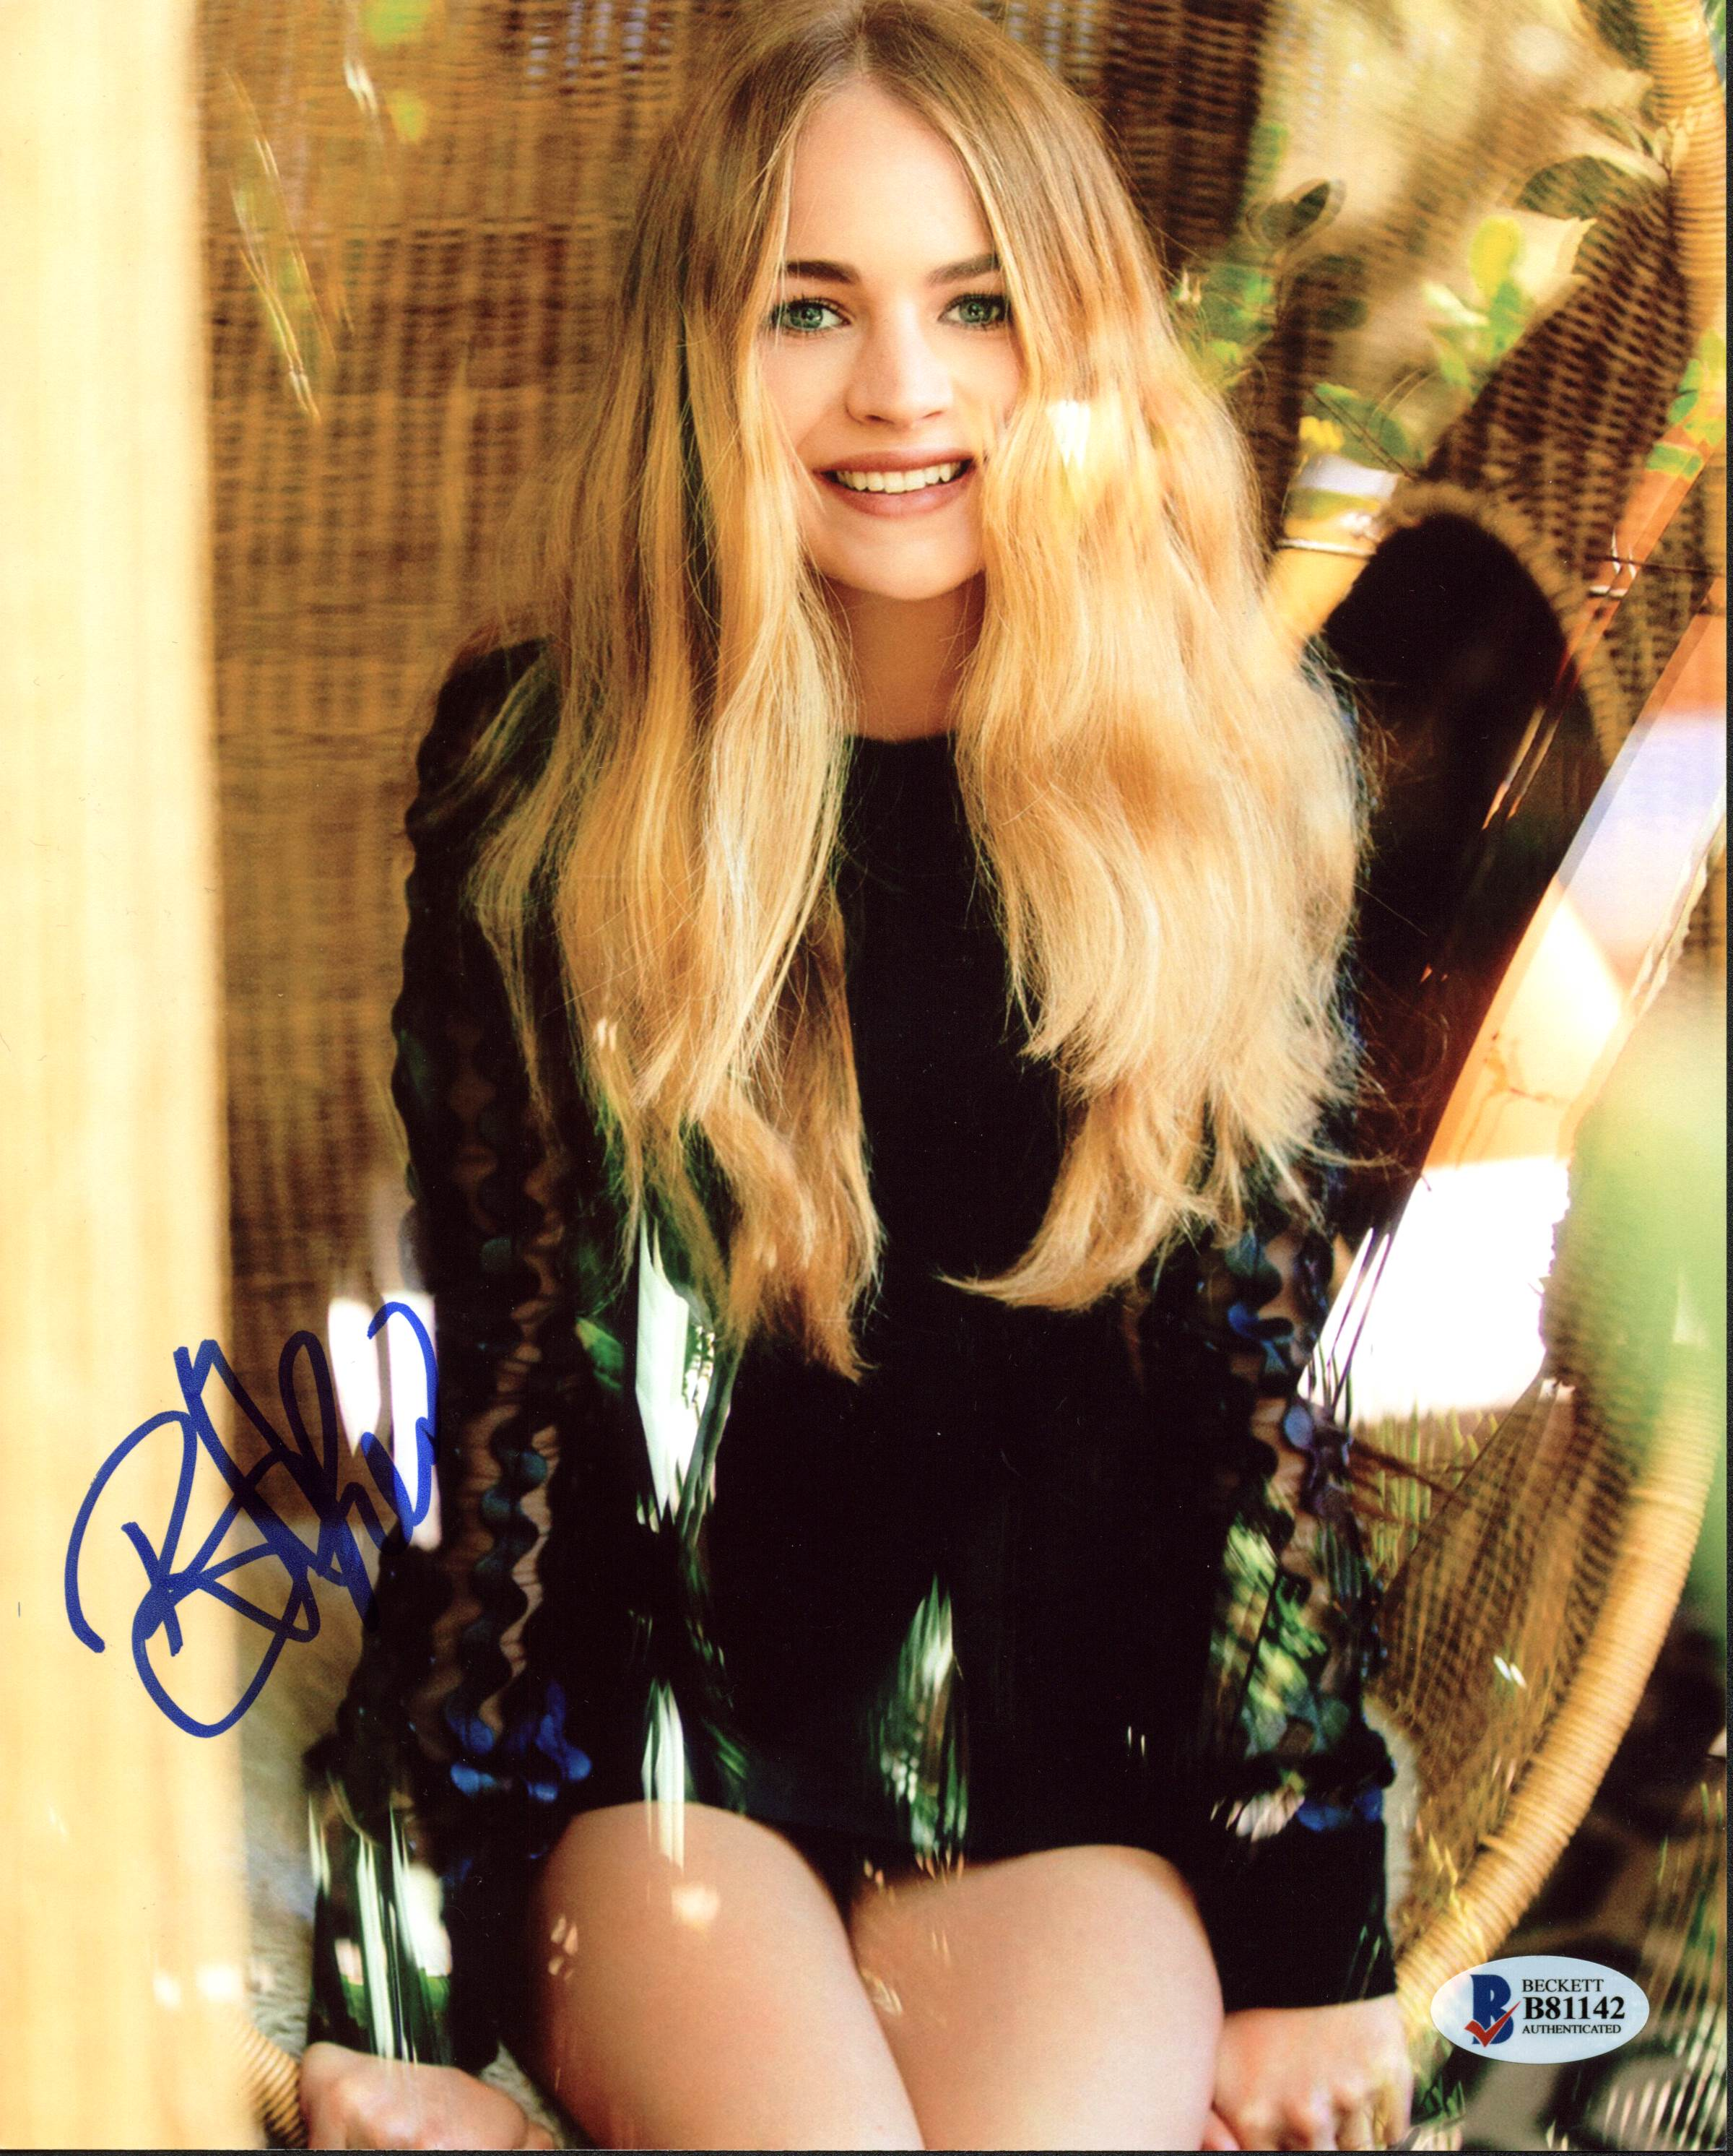 Britt Robertson Signed Autographed 8x10 Photograph Television